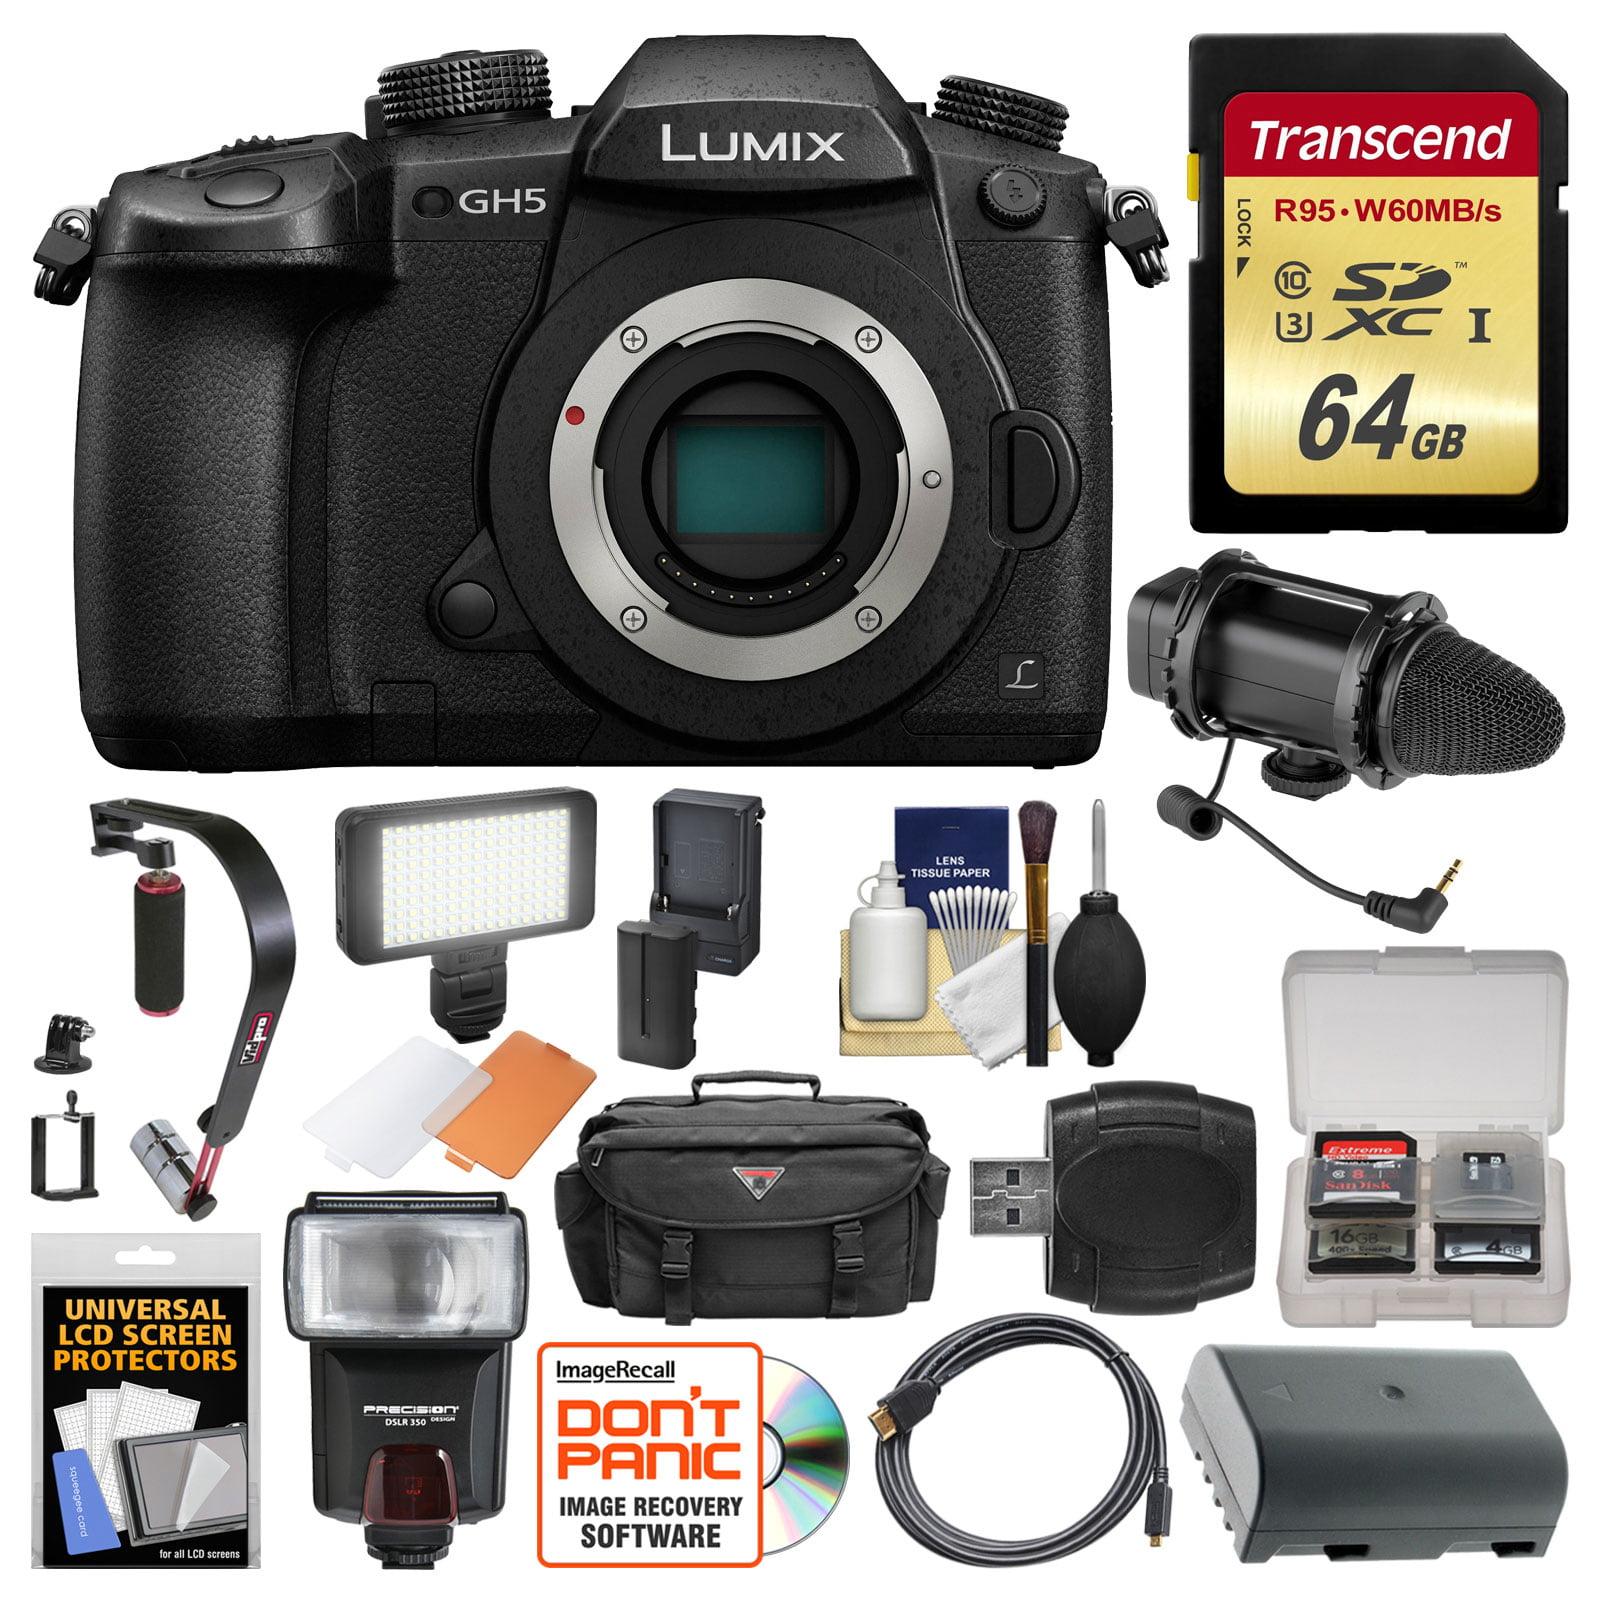 Panasonic Lumix DC-GH5 Wi-Fi 4K Digital Camera Body with 64GB Card + Case + Flash + Battery + Mic + Video... by Panasonic